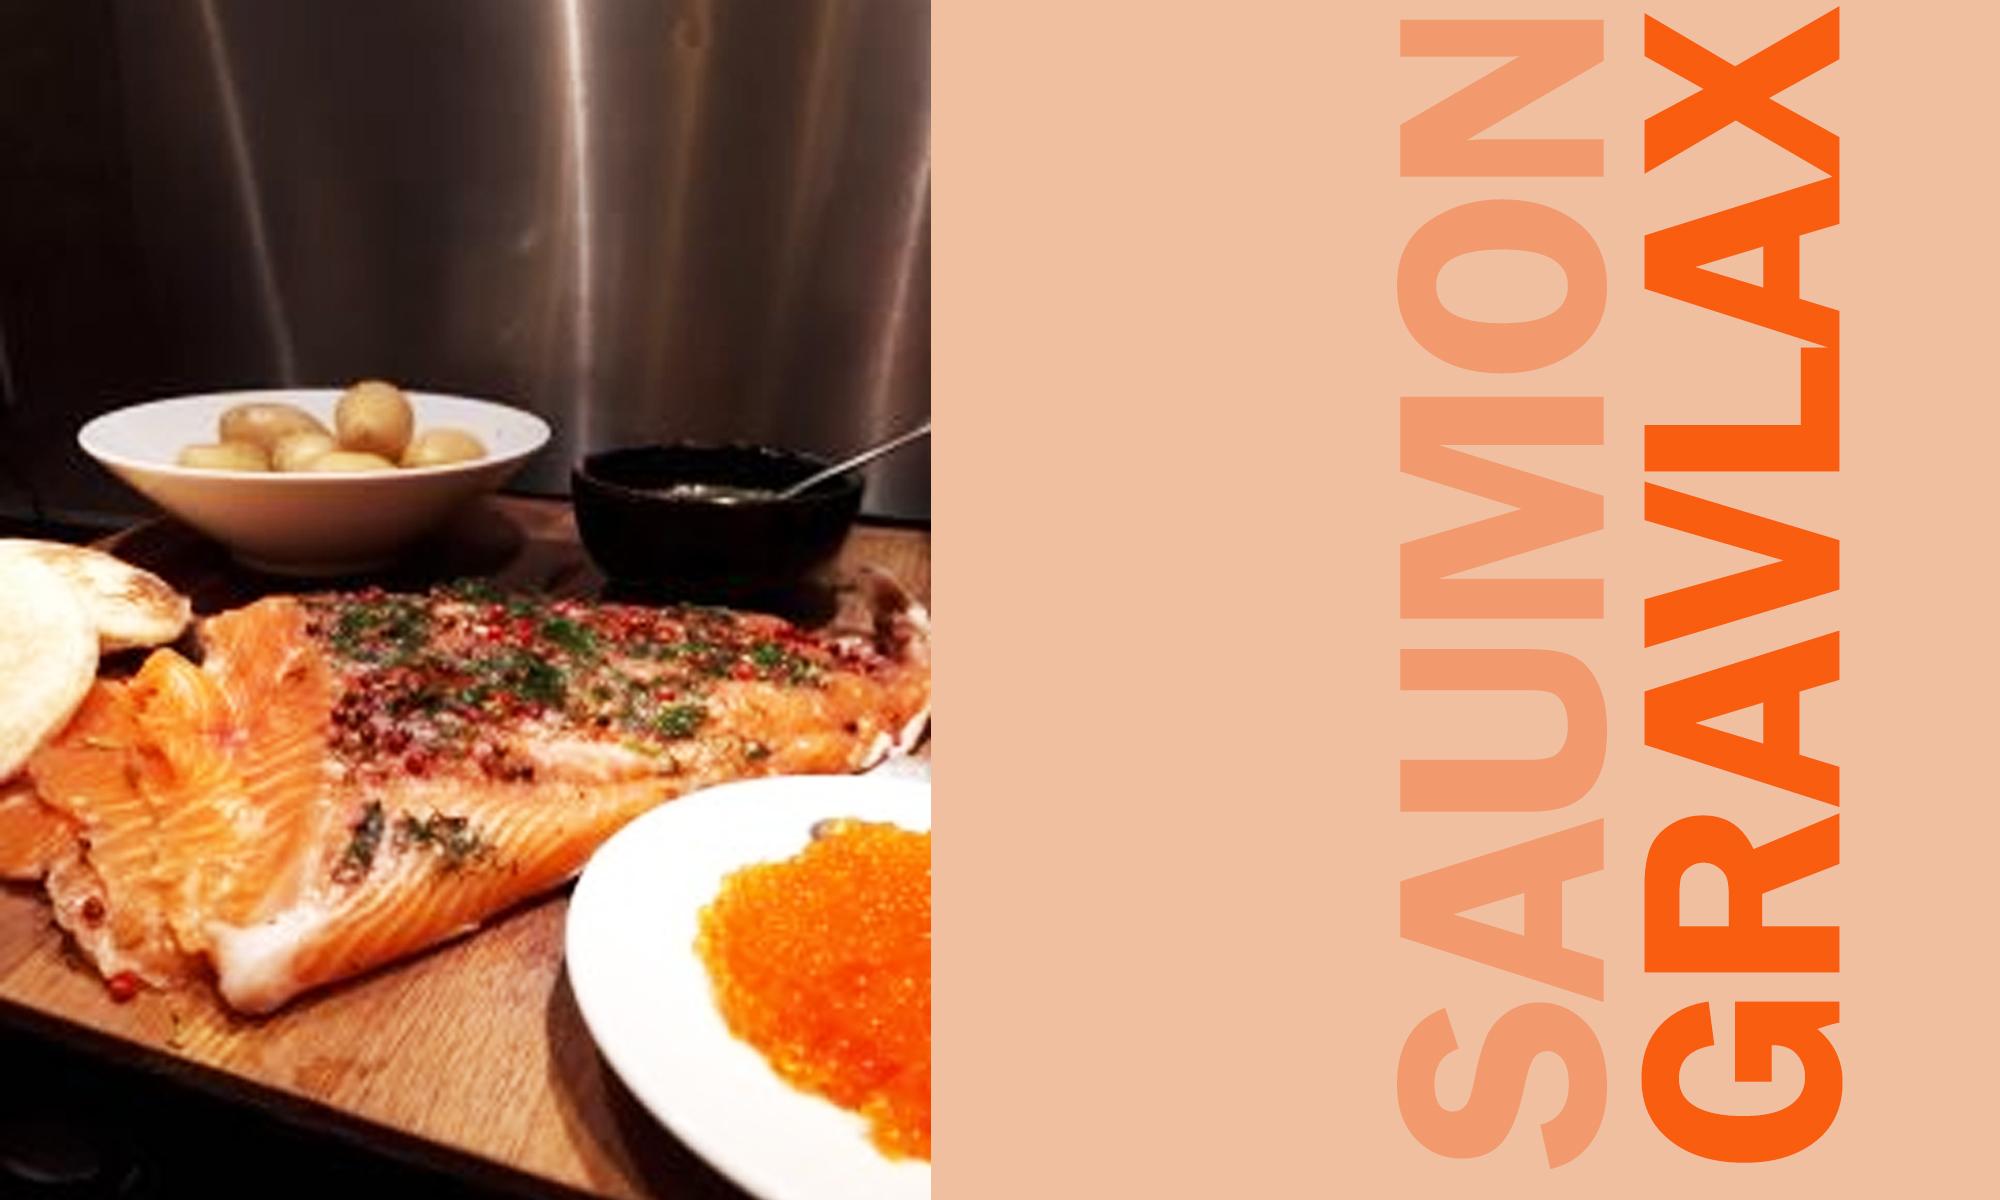 illustration saumon gravlax